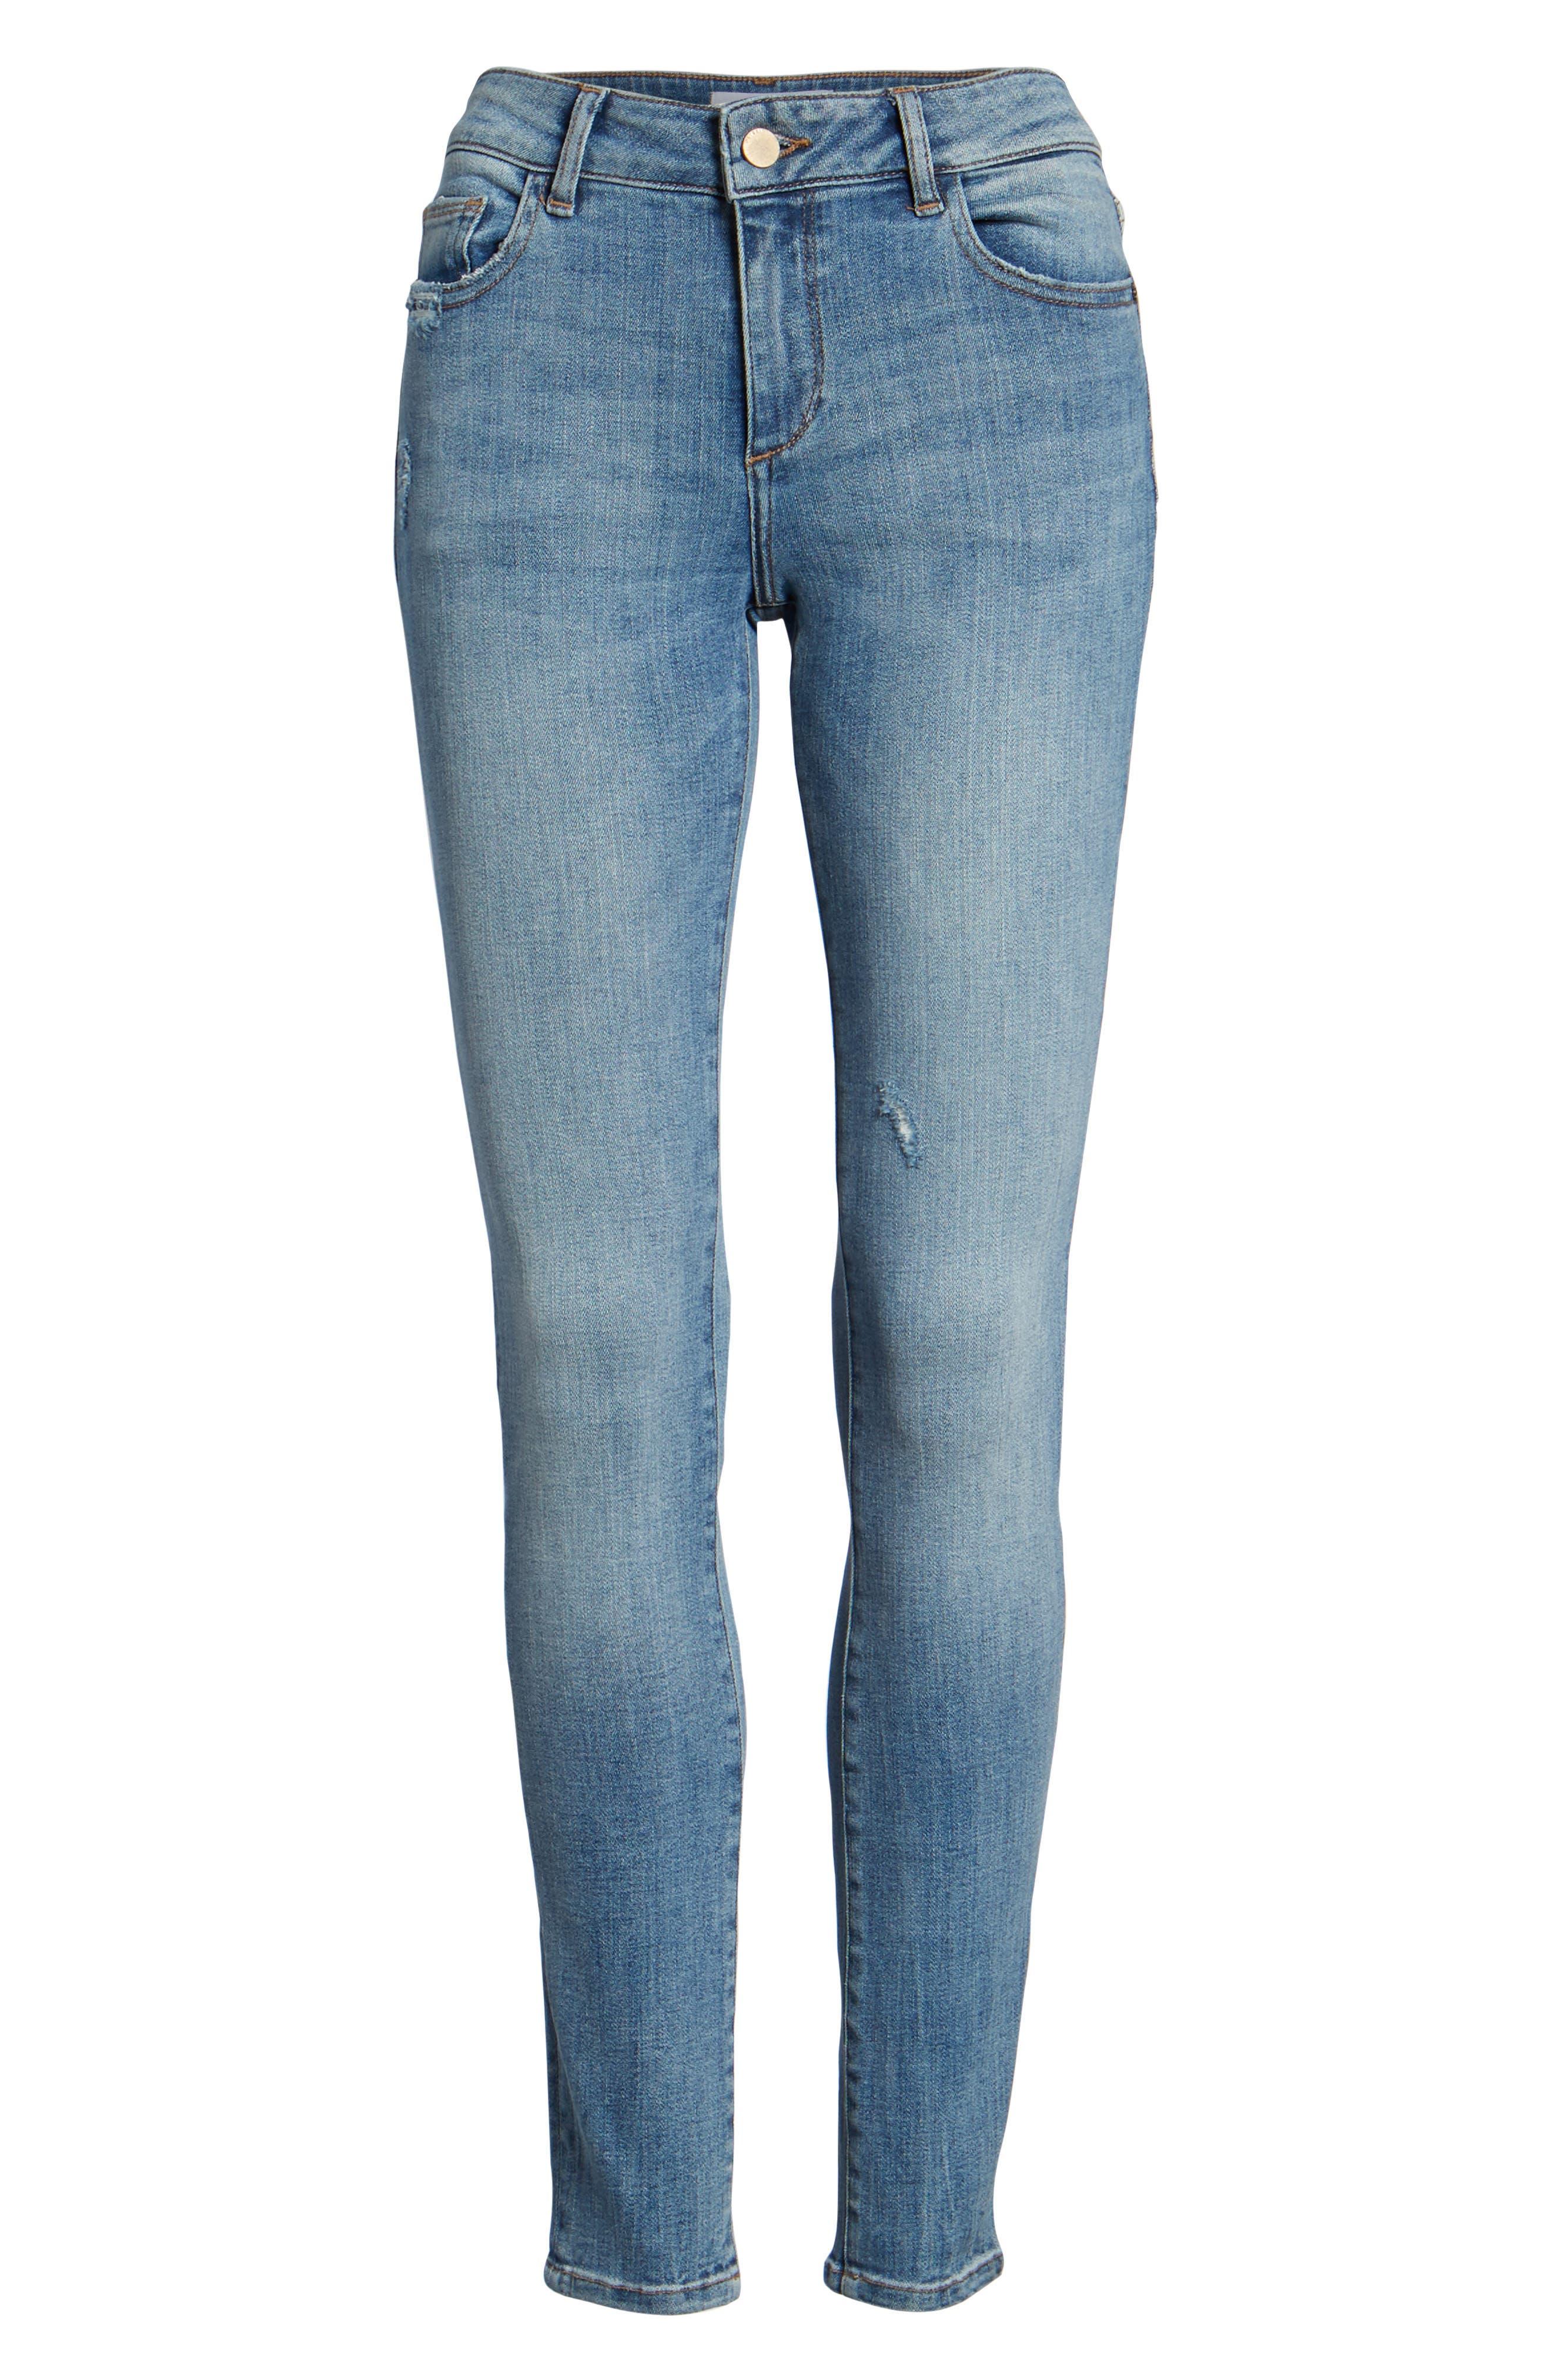 Florence Instasculpt Skinny Jeans,                             Alternate thumbnail 7, color,                             Delano